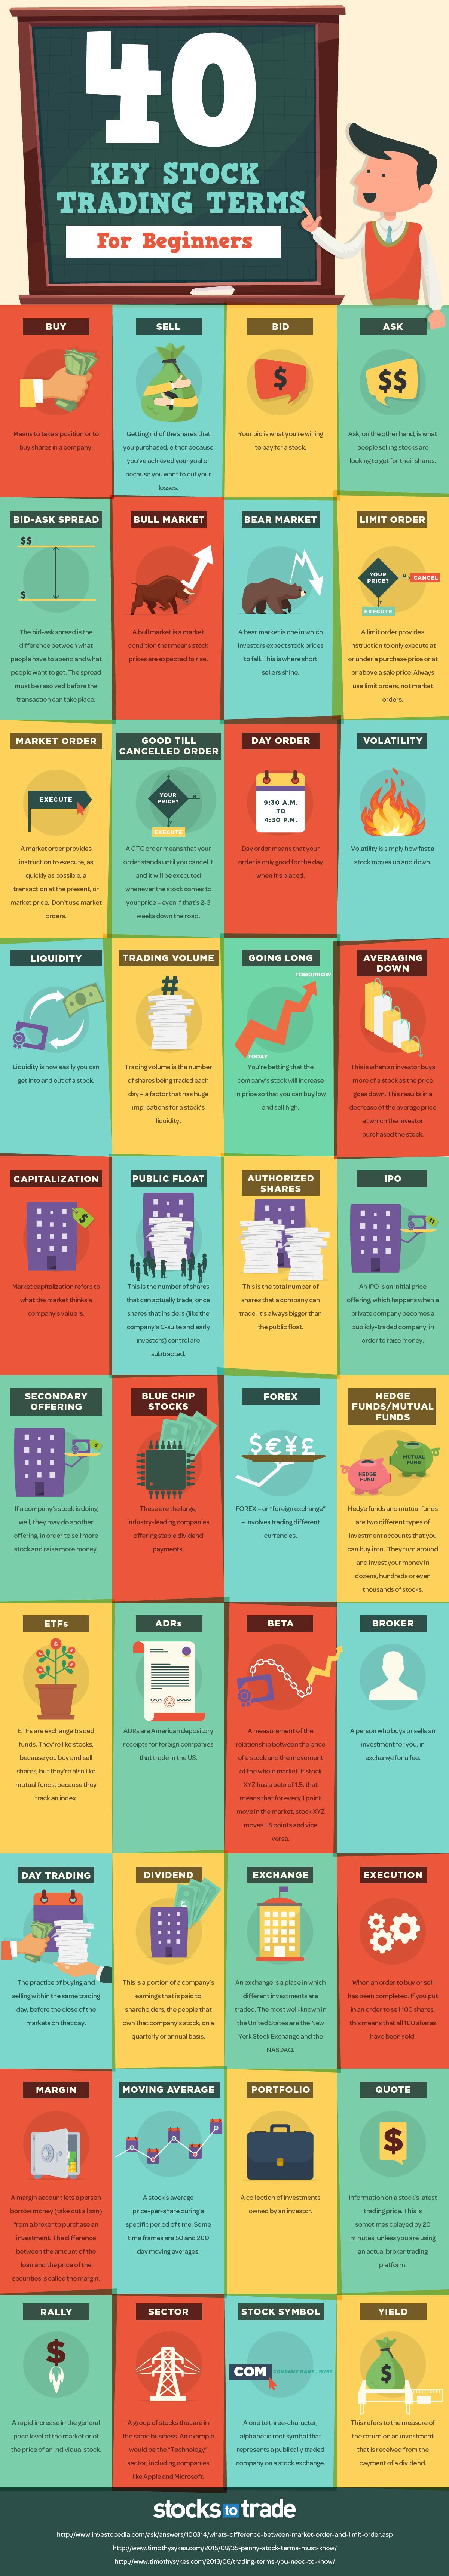 Beginner's Guide - Basic Stock Trading Terminologies - Infographic